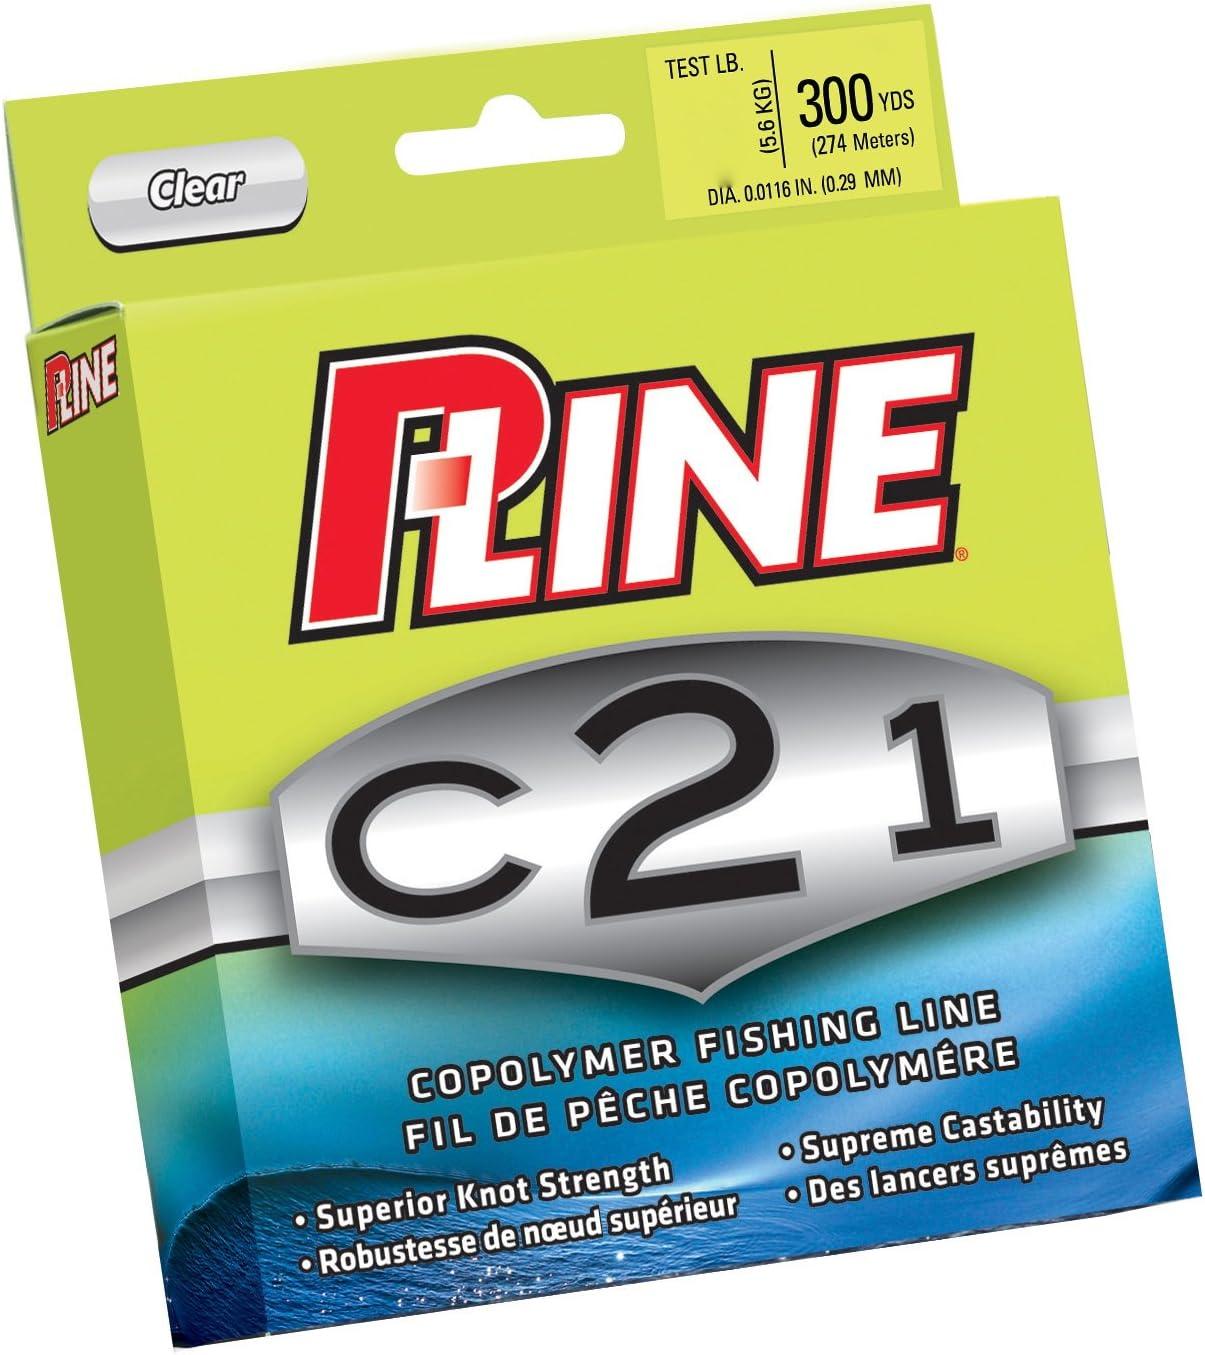 P-Line C21 Copymer Filler Spool